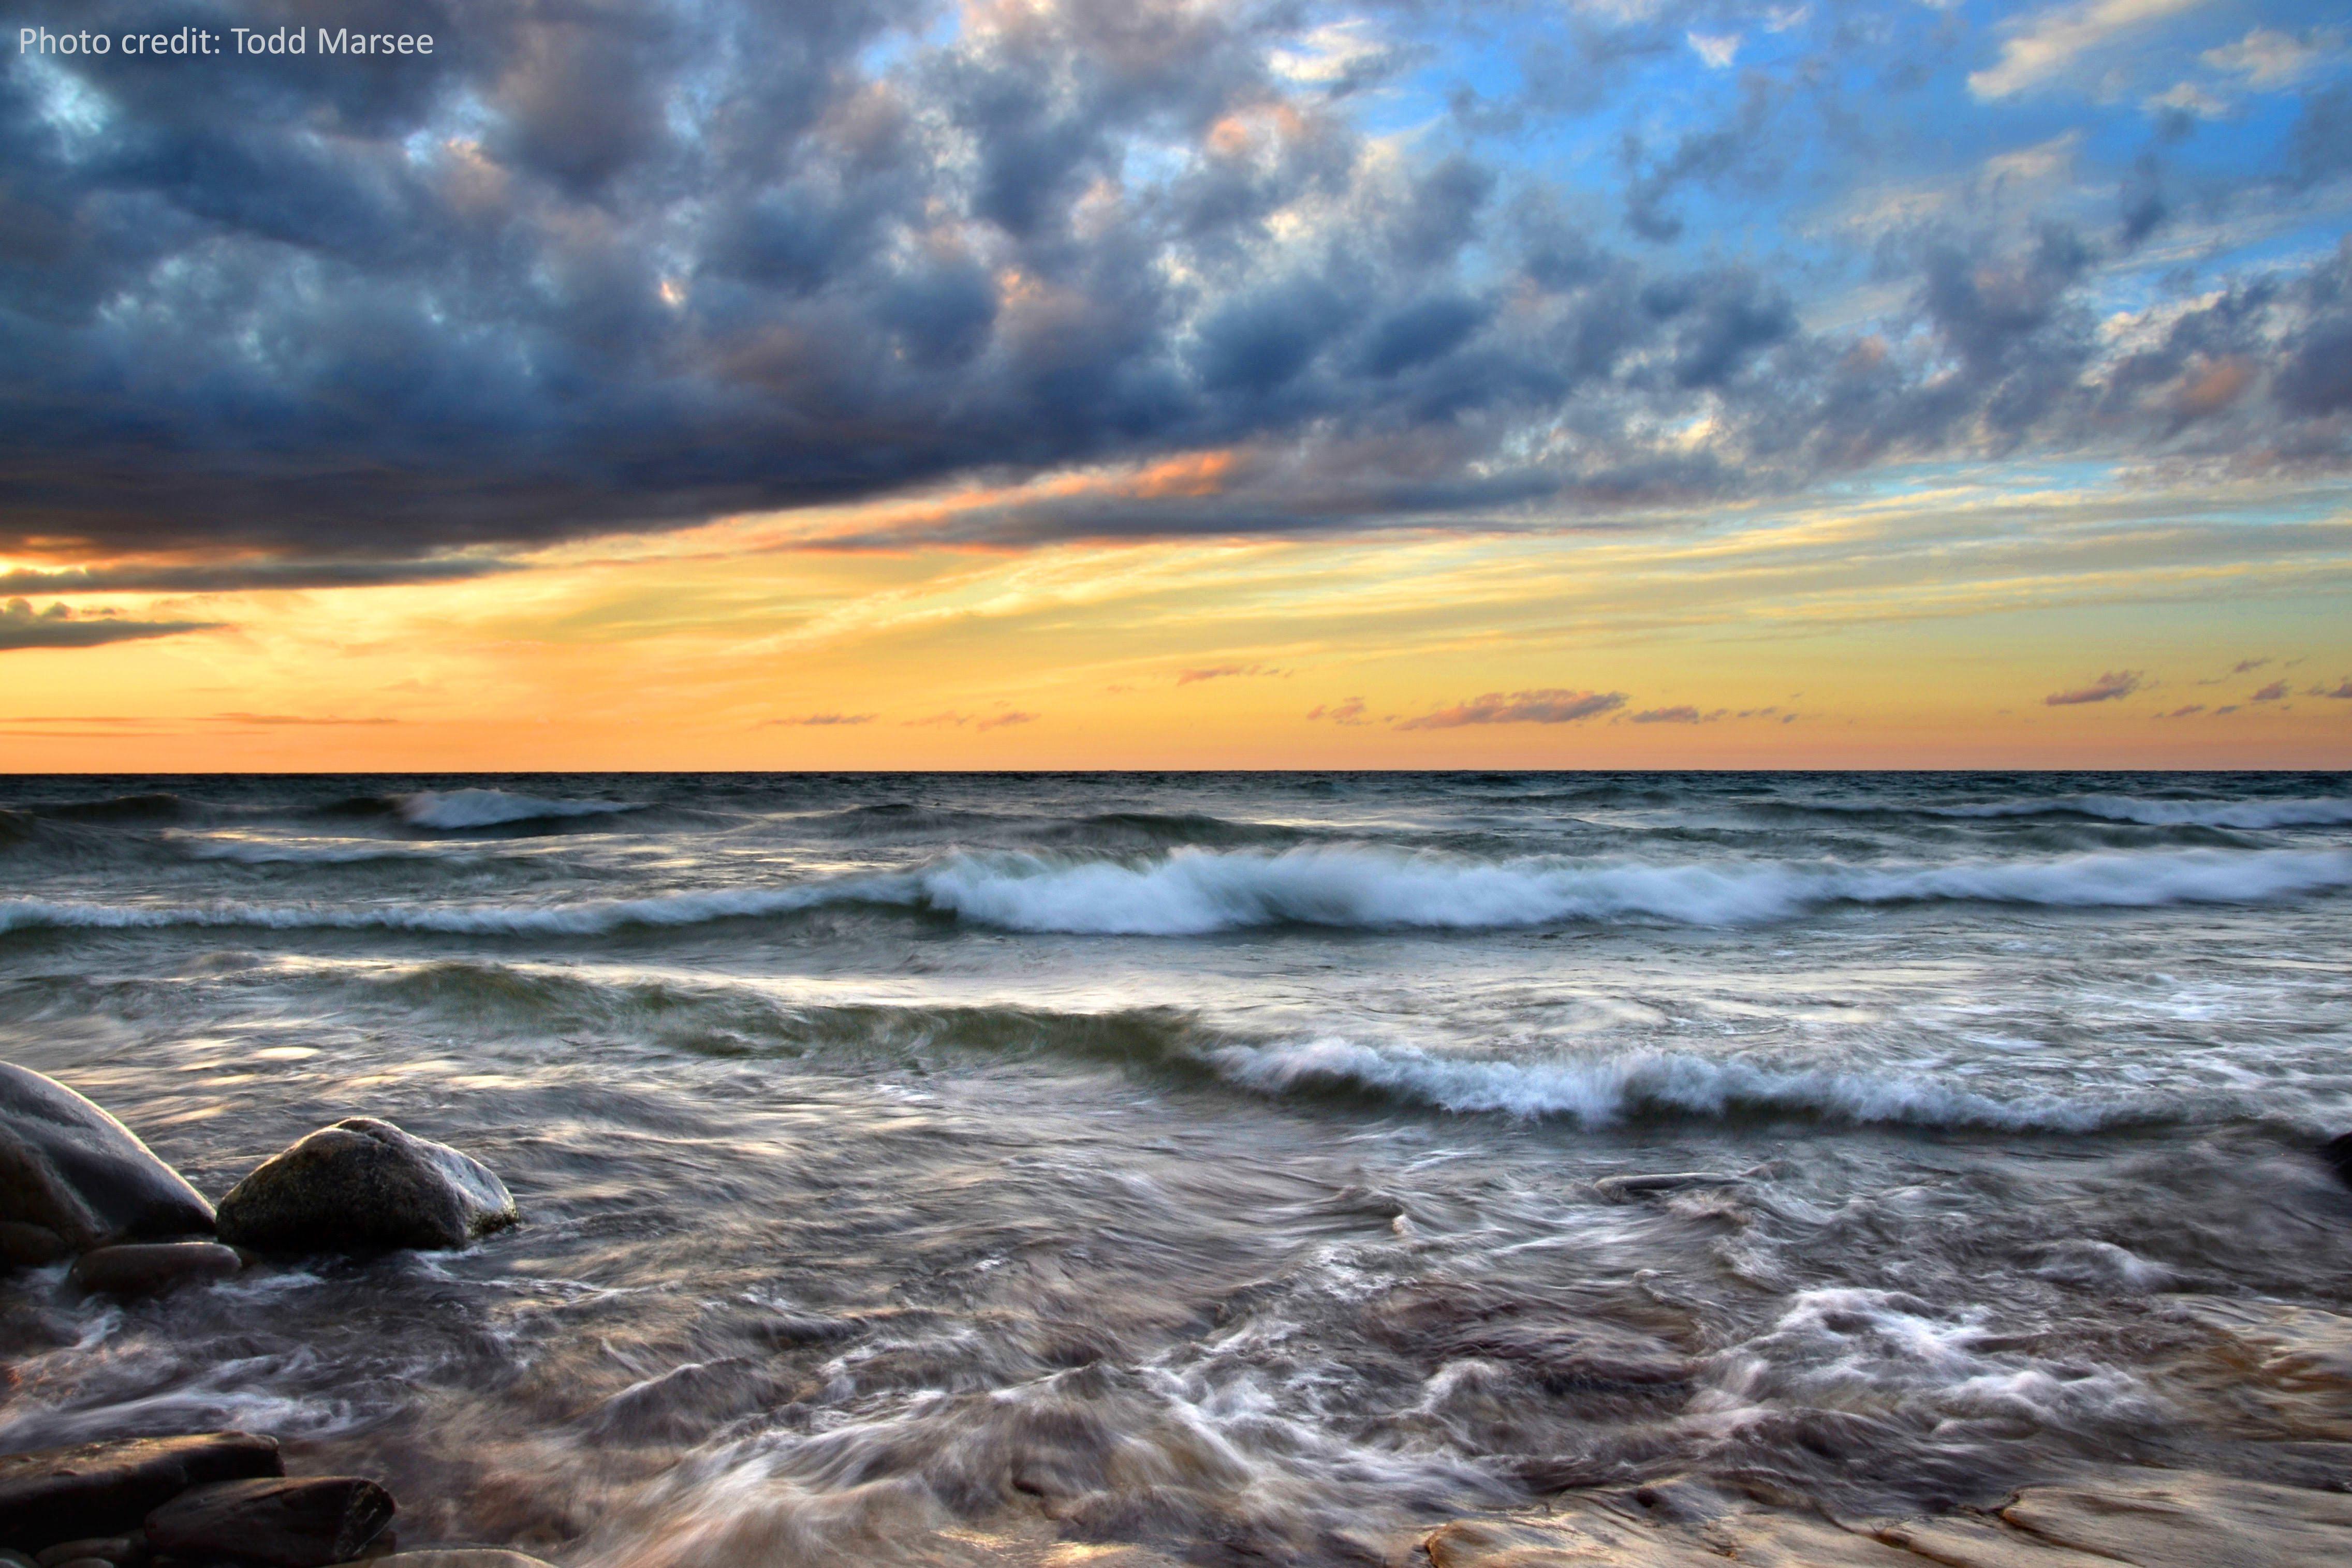 Pictured Rocks National Lakeshore, Lake Superior, Michigan